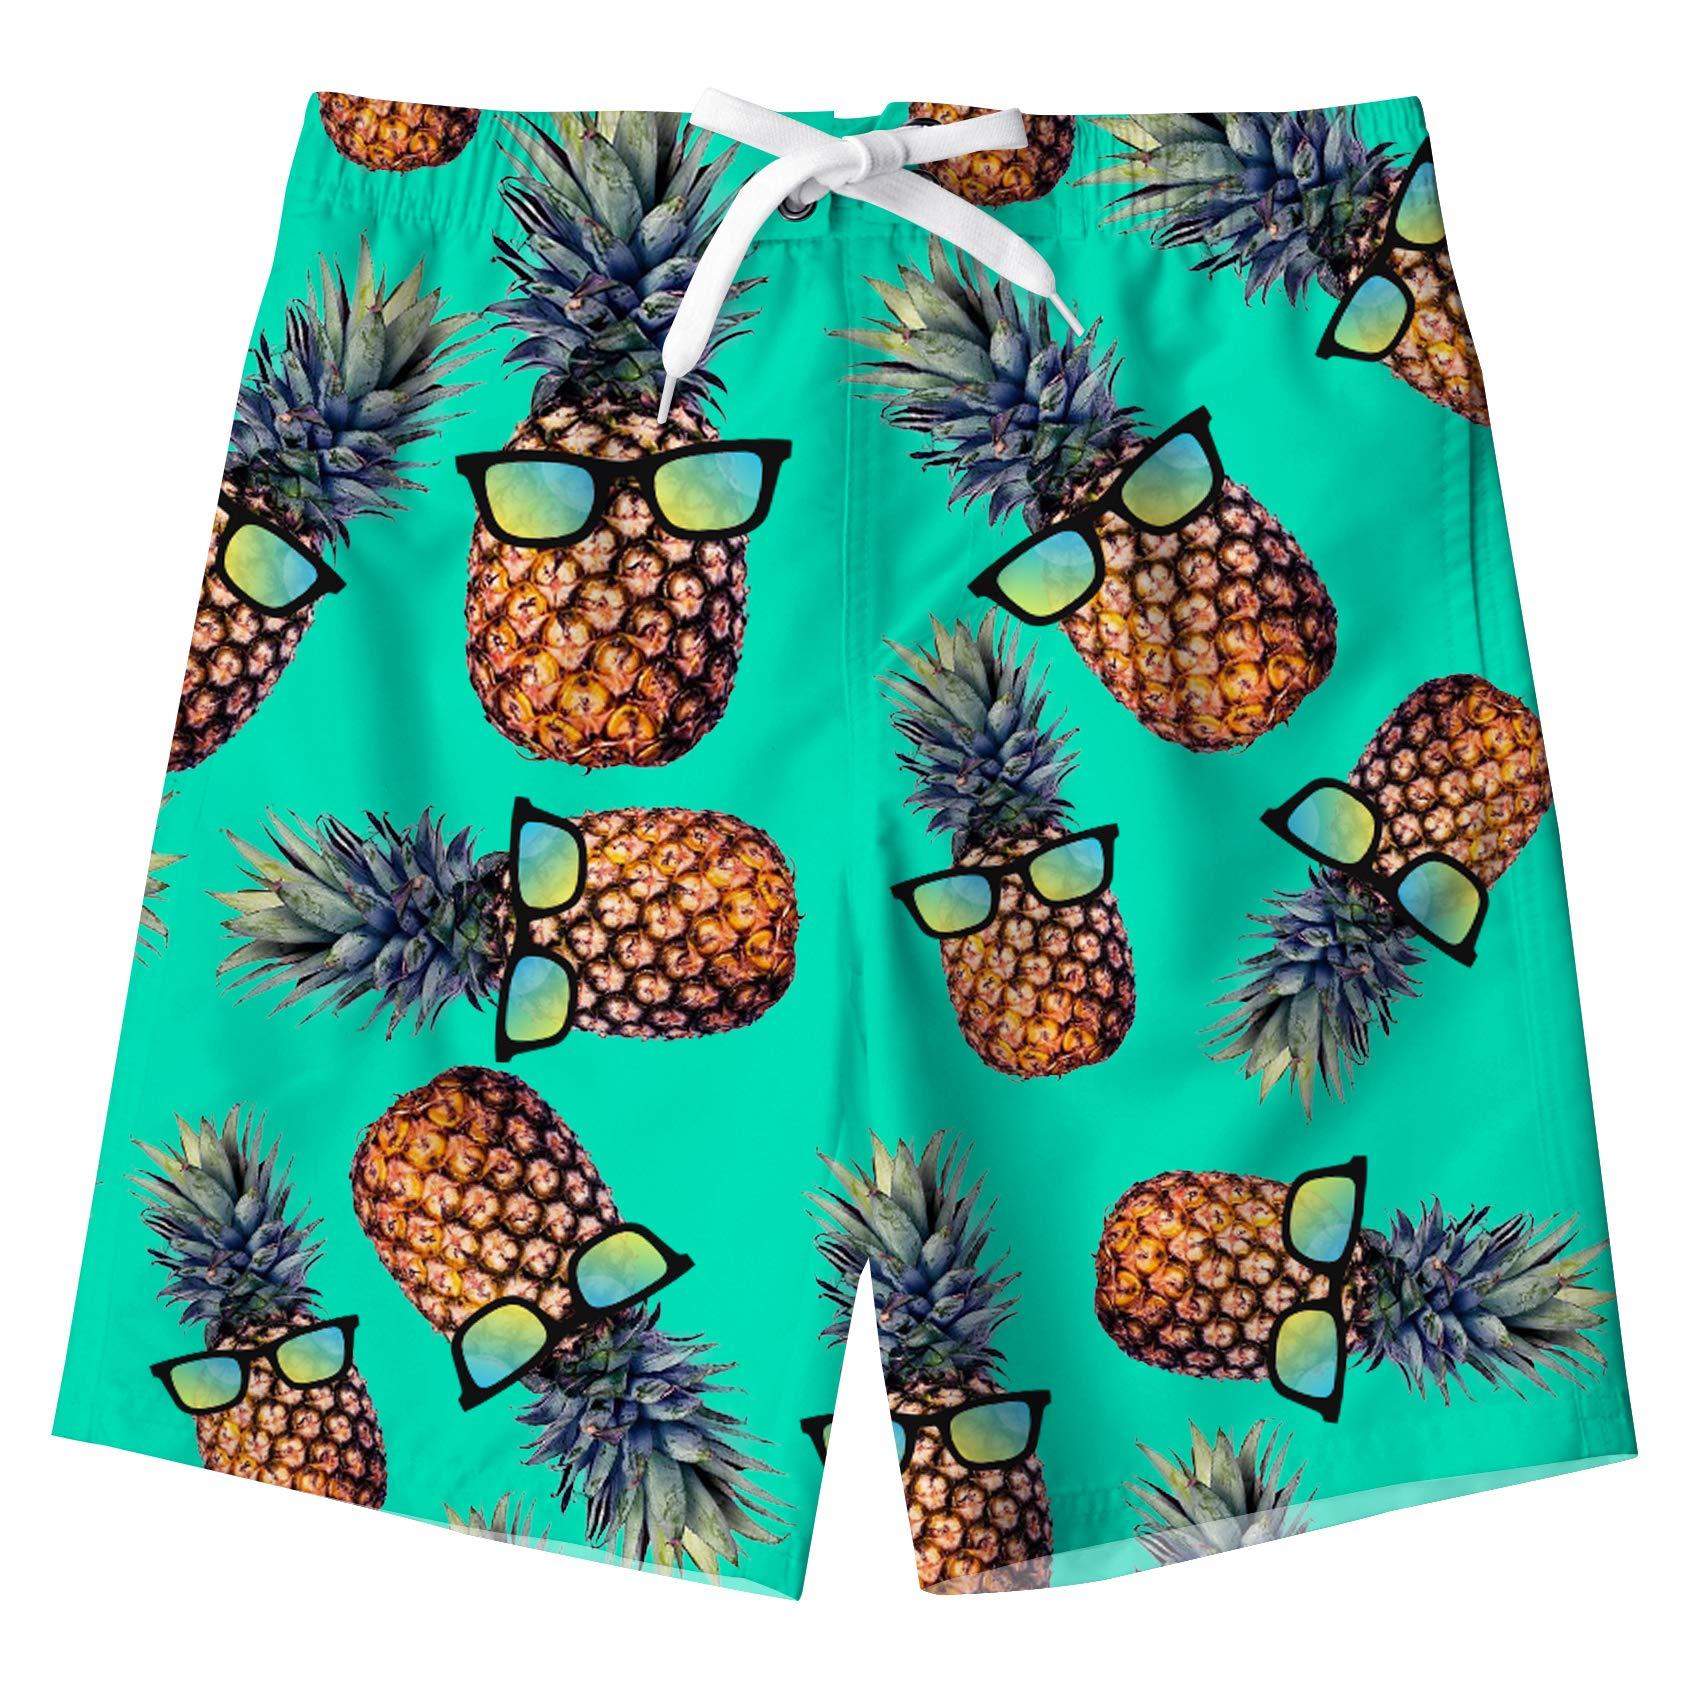 UNICOMIDEA Cute Kids Beach Shorts Boys Swim Trunks 3D Pineapple Print Swimwear Quick Dry Beach Surf Shorts for 6 Years